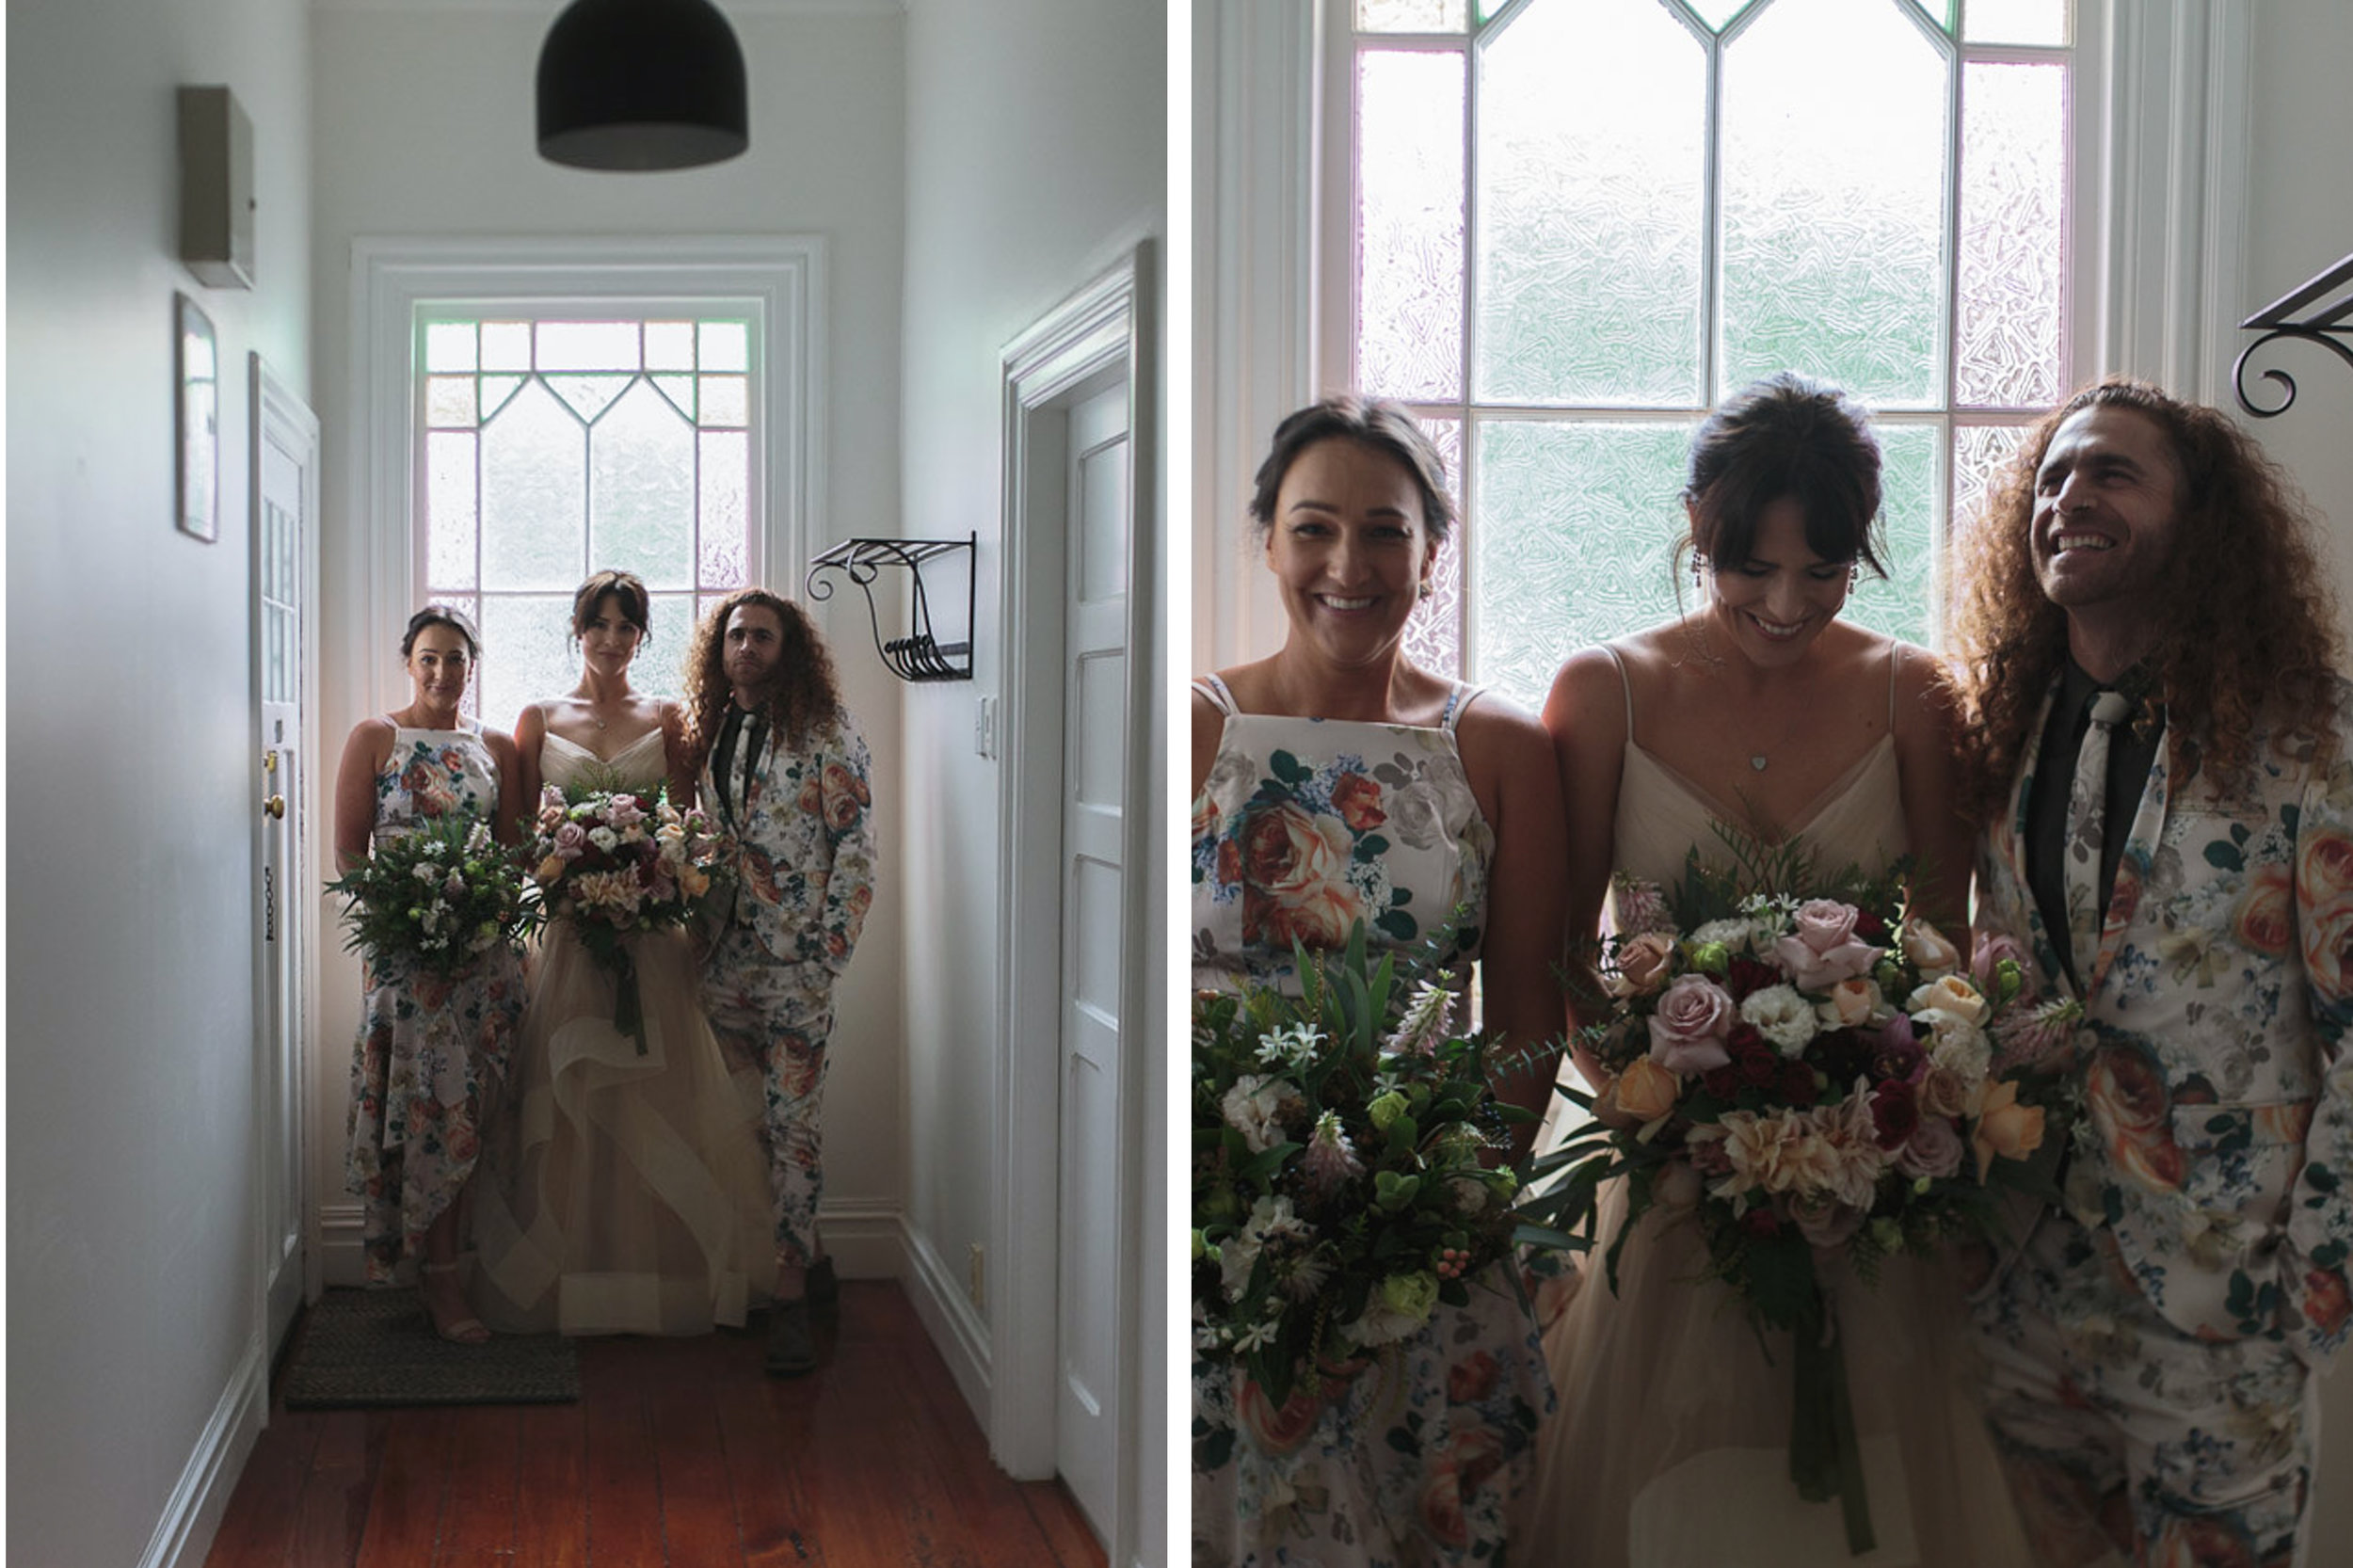 light-and-arrows-auckland-urban-wedding-blog-37.jpg